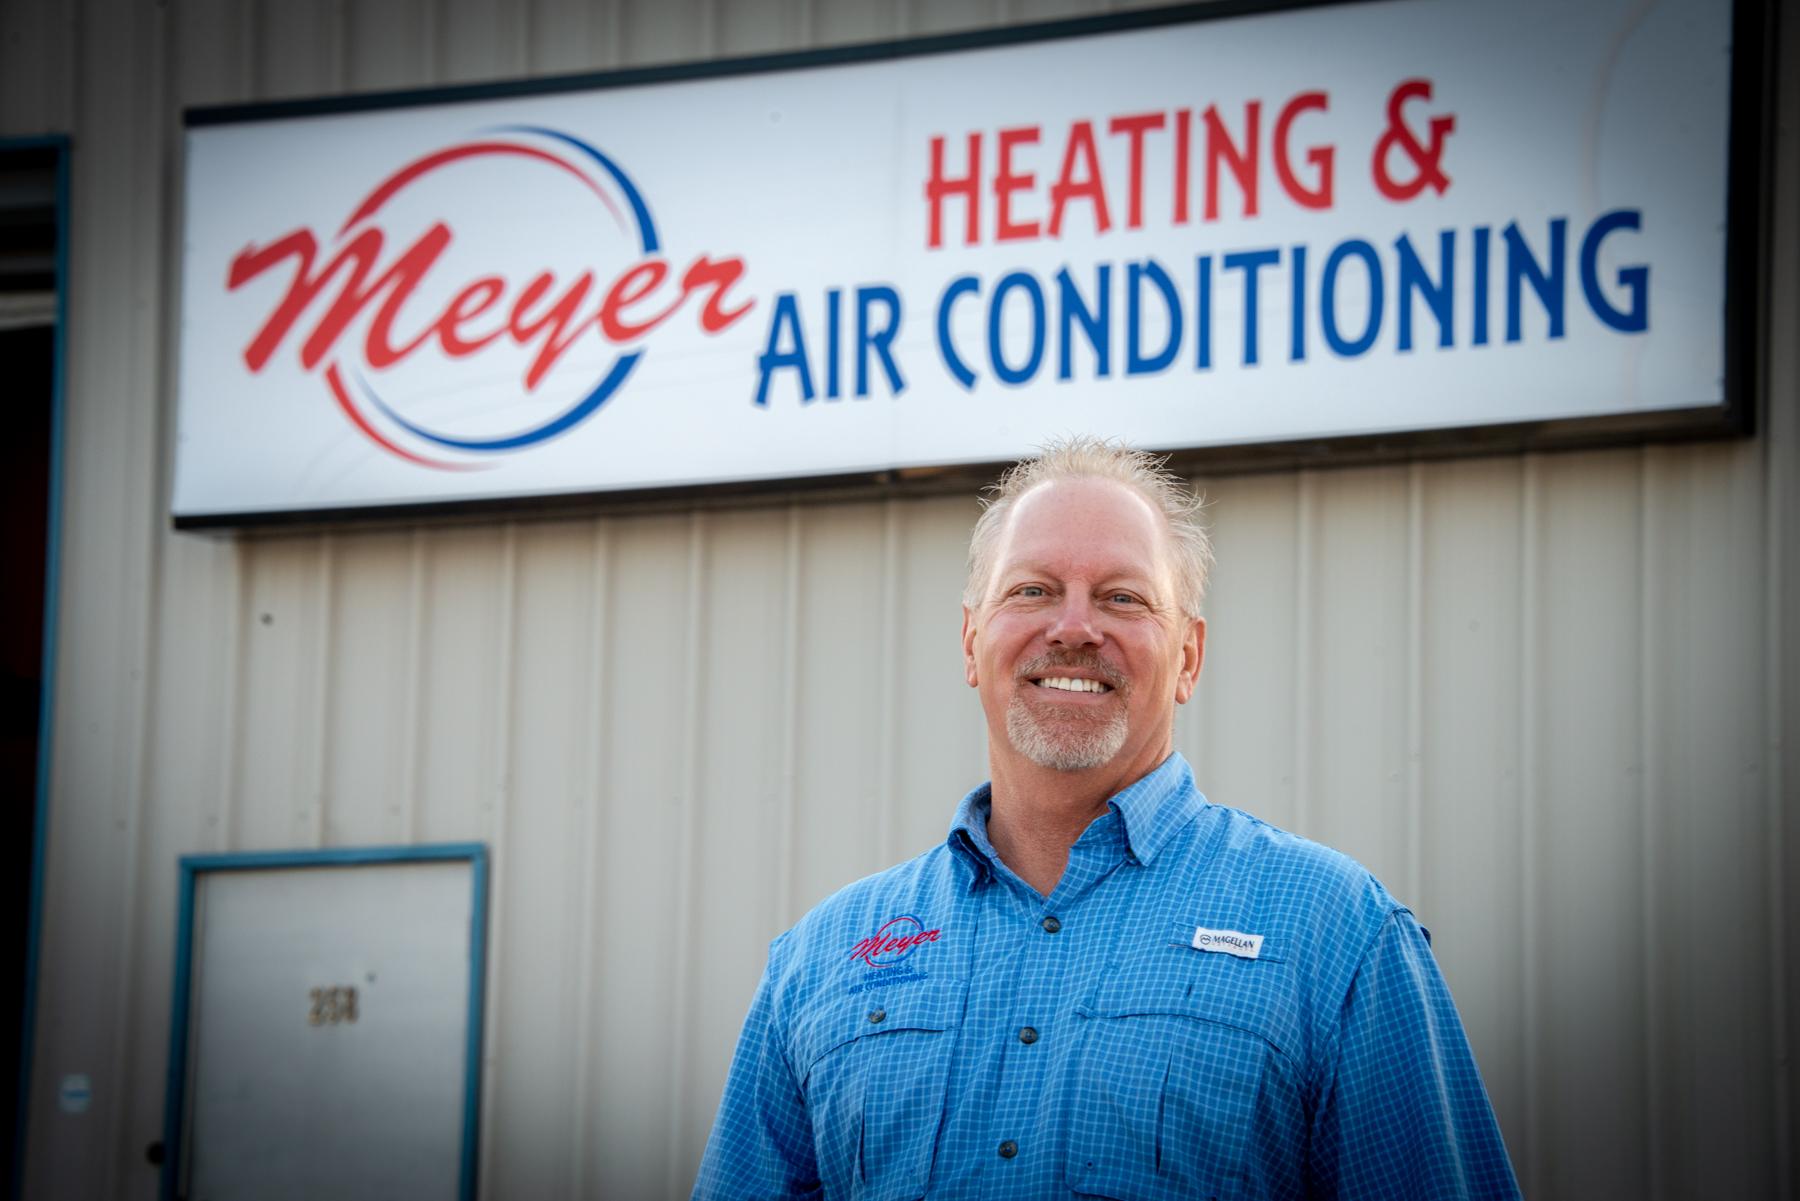 Meyer Heating & Air Conditioning reviews   Heating & Air Conditioning/HVAC at 258 Deborah Drive - New Braunfels TX